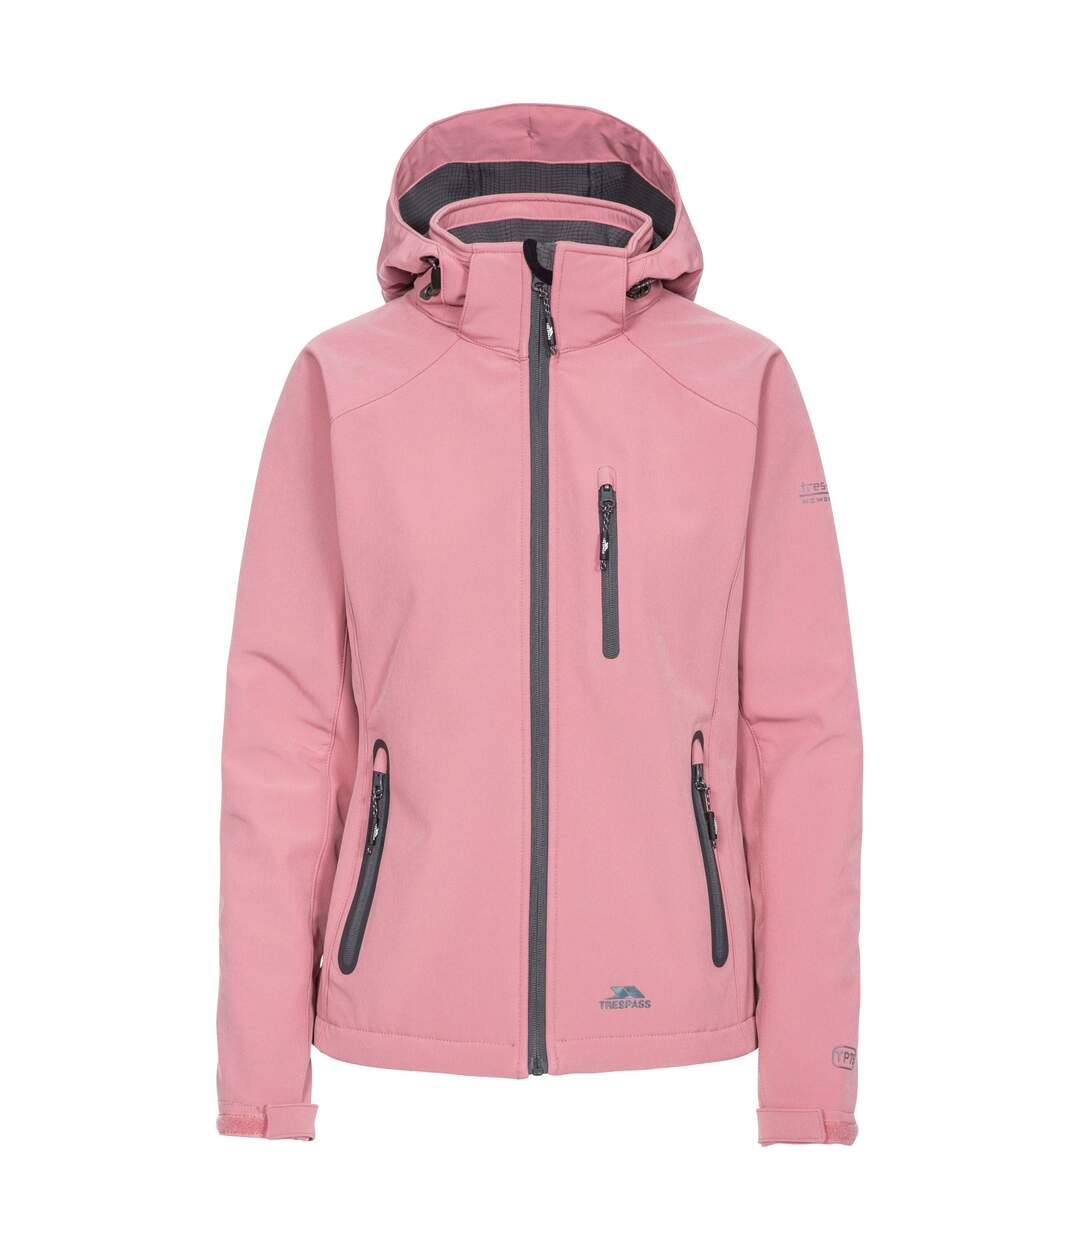 Trespass Womens/Ladies Bela II Waterproof Softshell Jacket (Dusty Rose) - UTTP3440